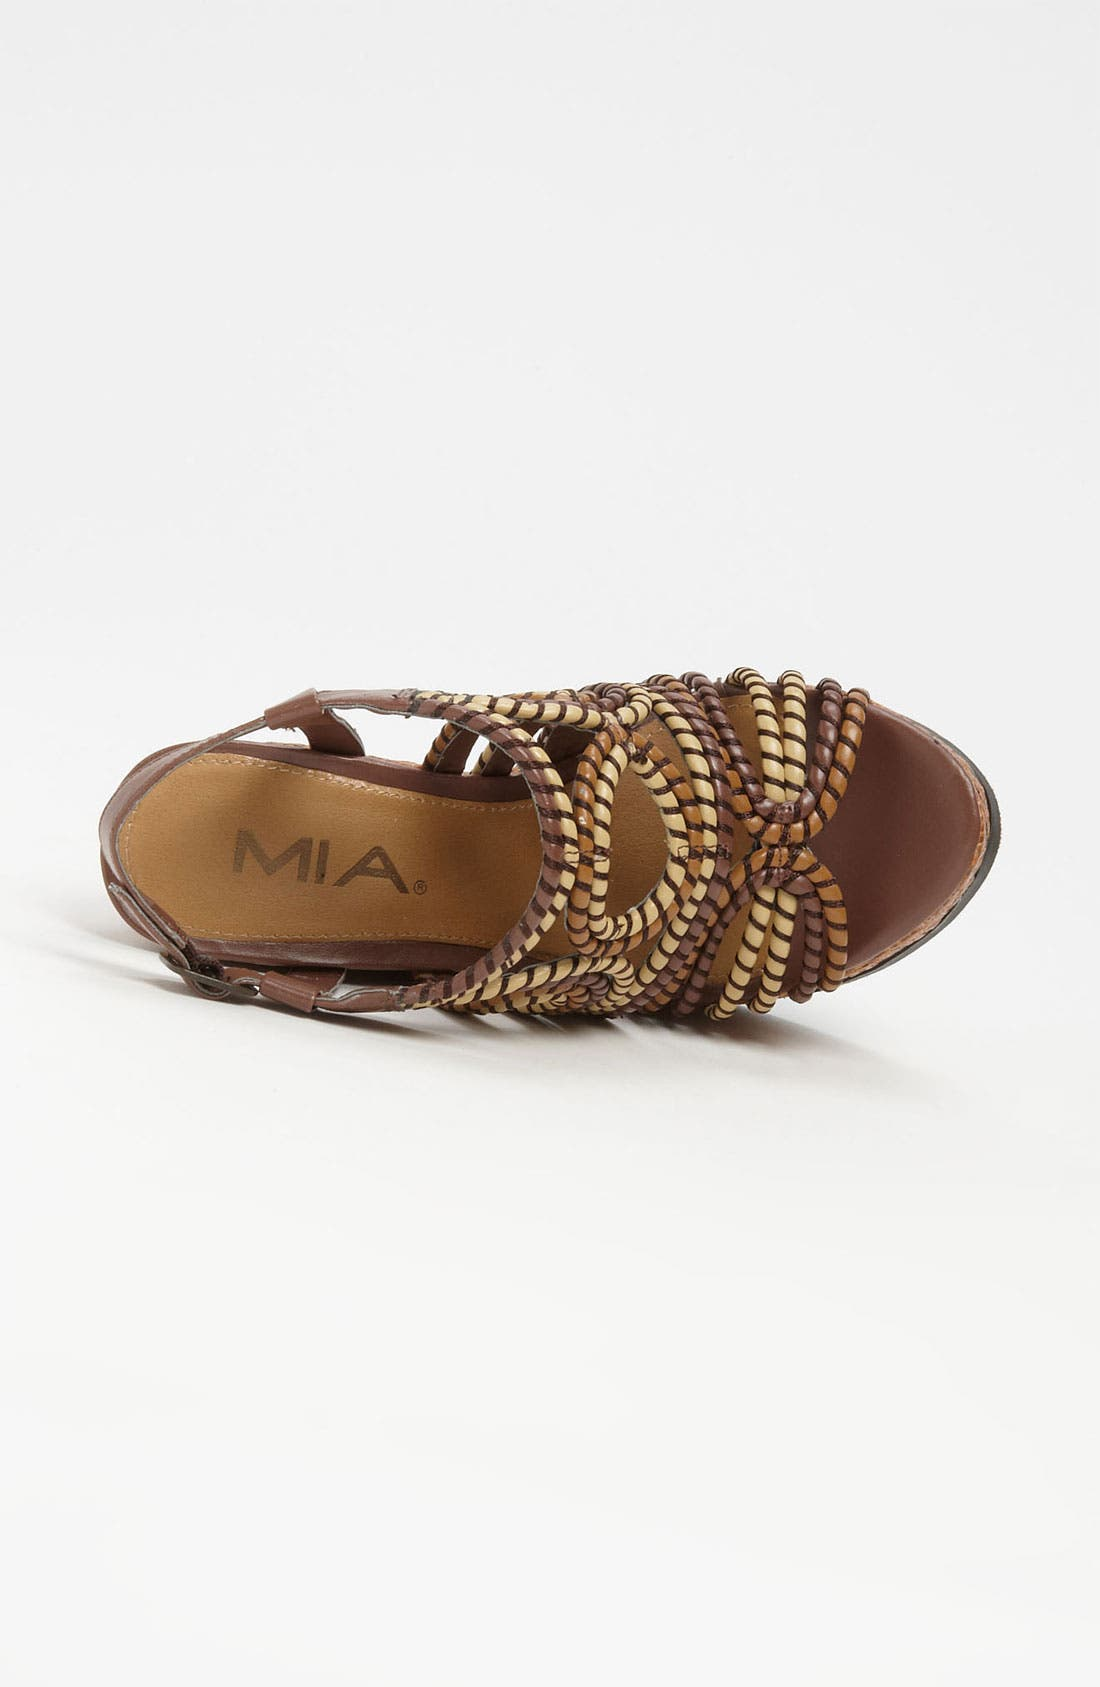 Alternate Image 3  - MIA 'Evelyn' Wedge Sandal